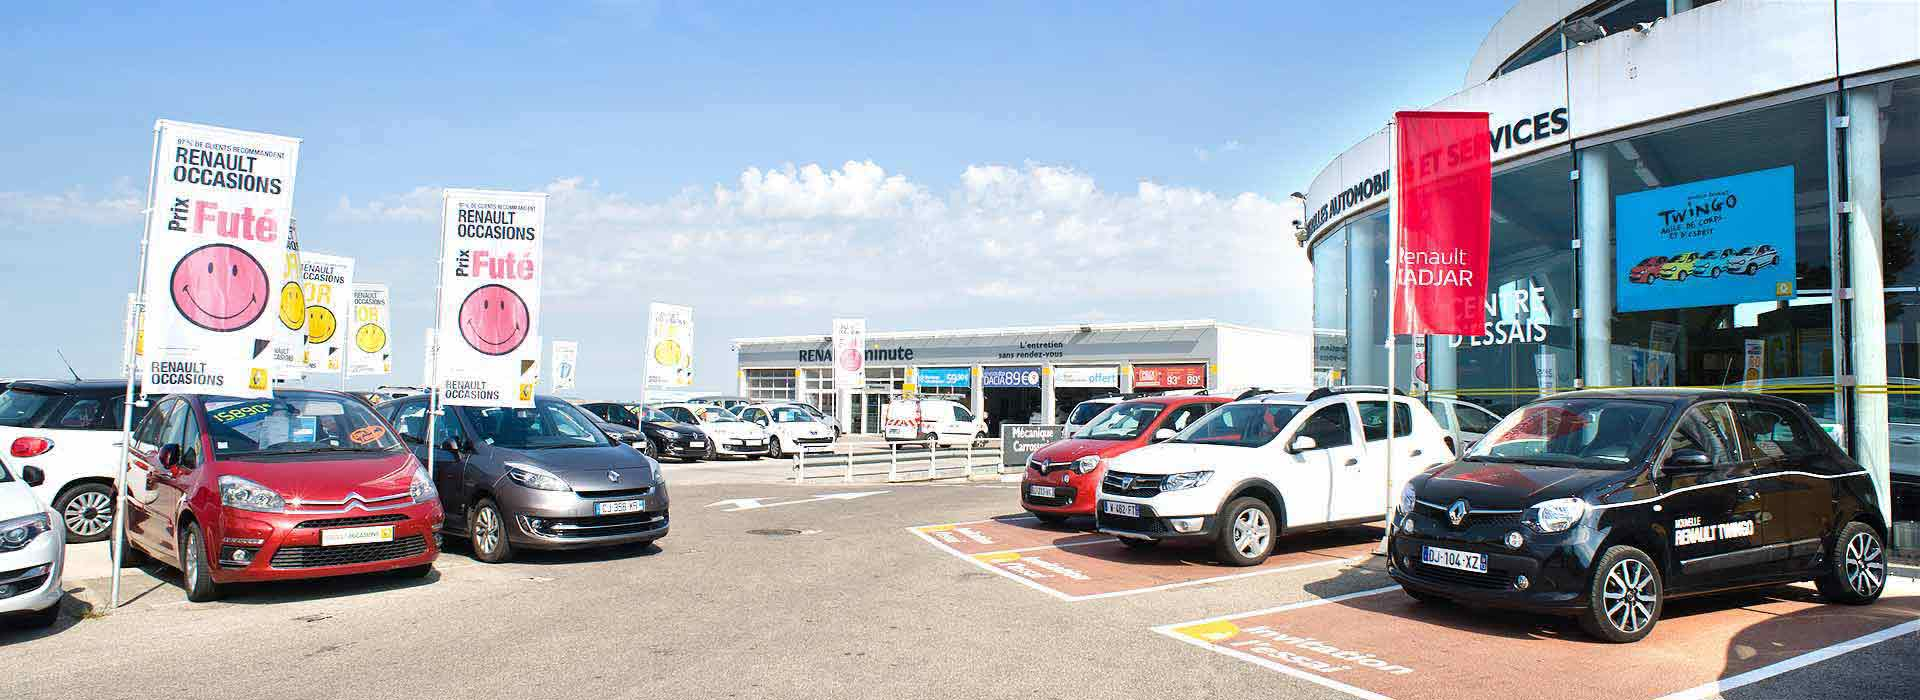 Renault marignane concessionnaire garage bouches du rh ne 13 - Garage peugeot vitrolles ...